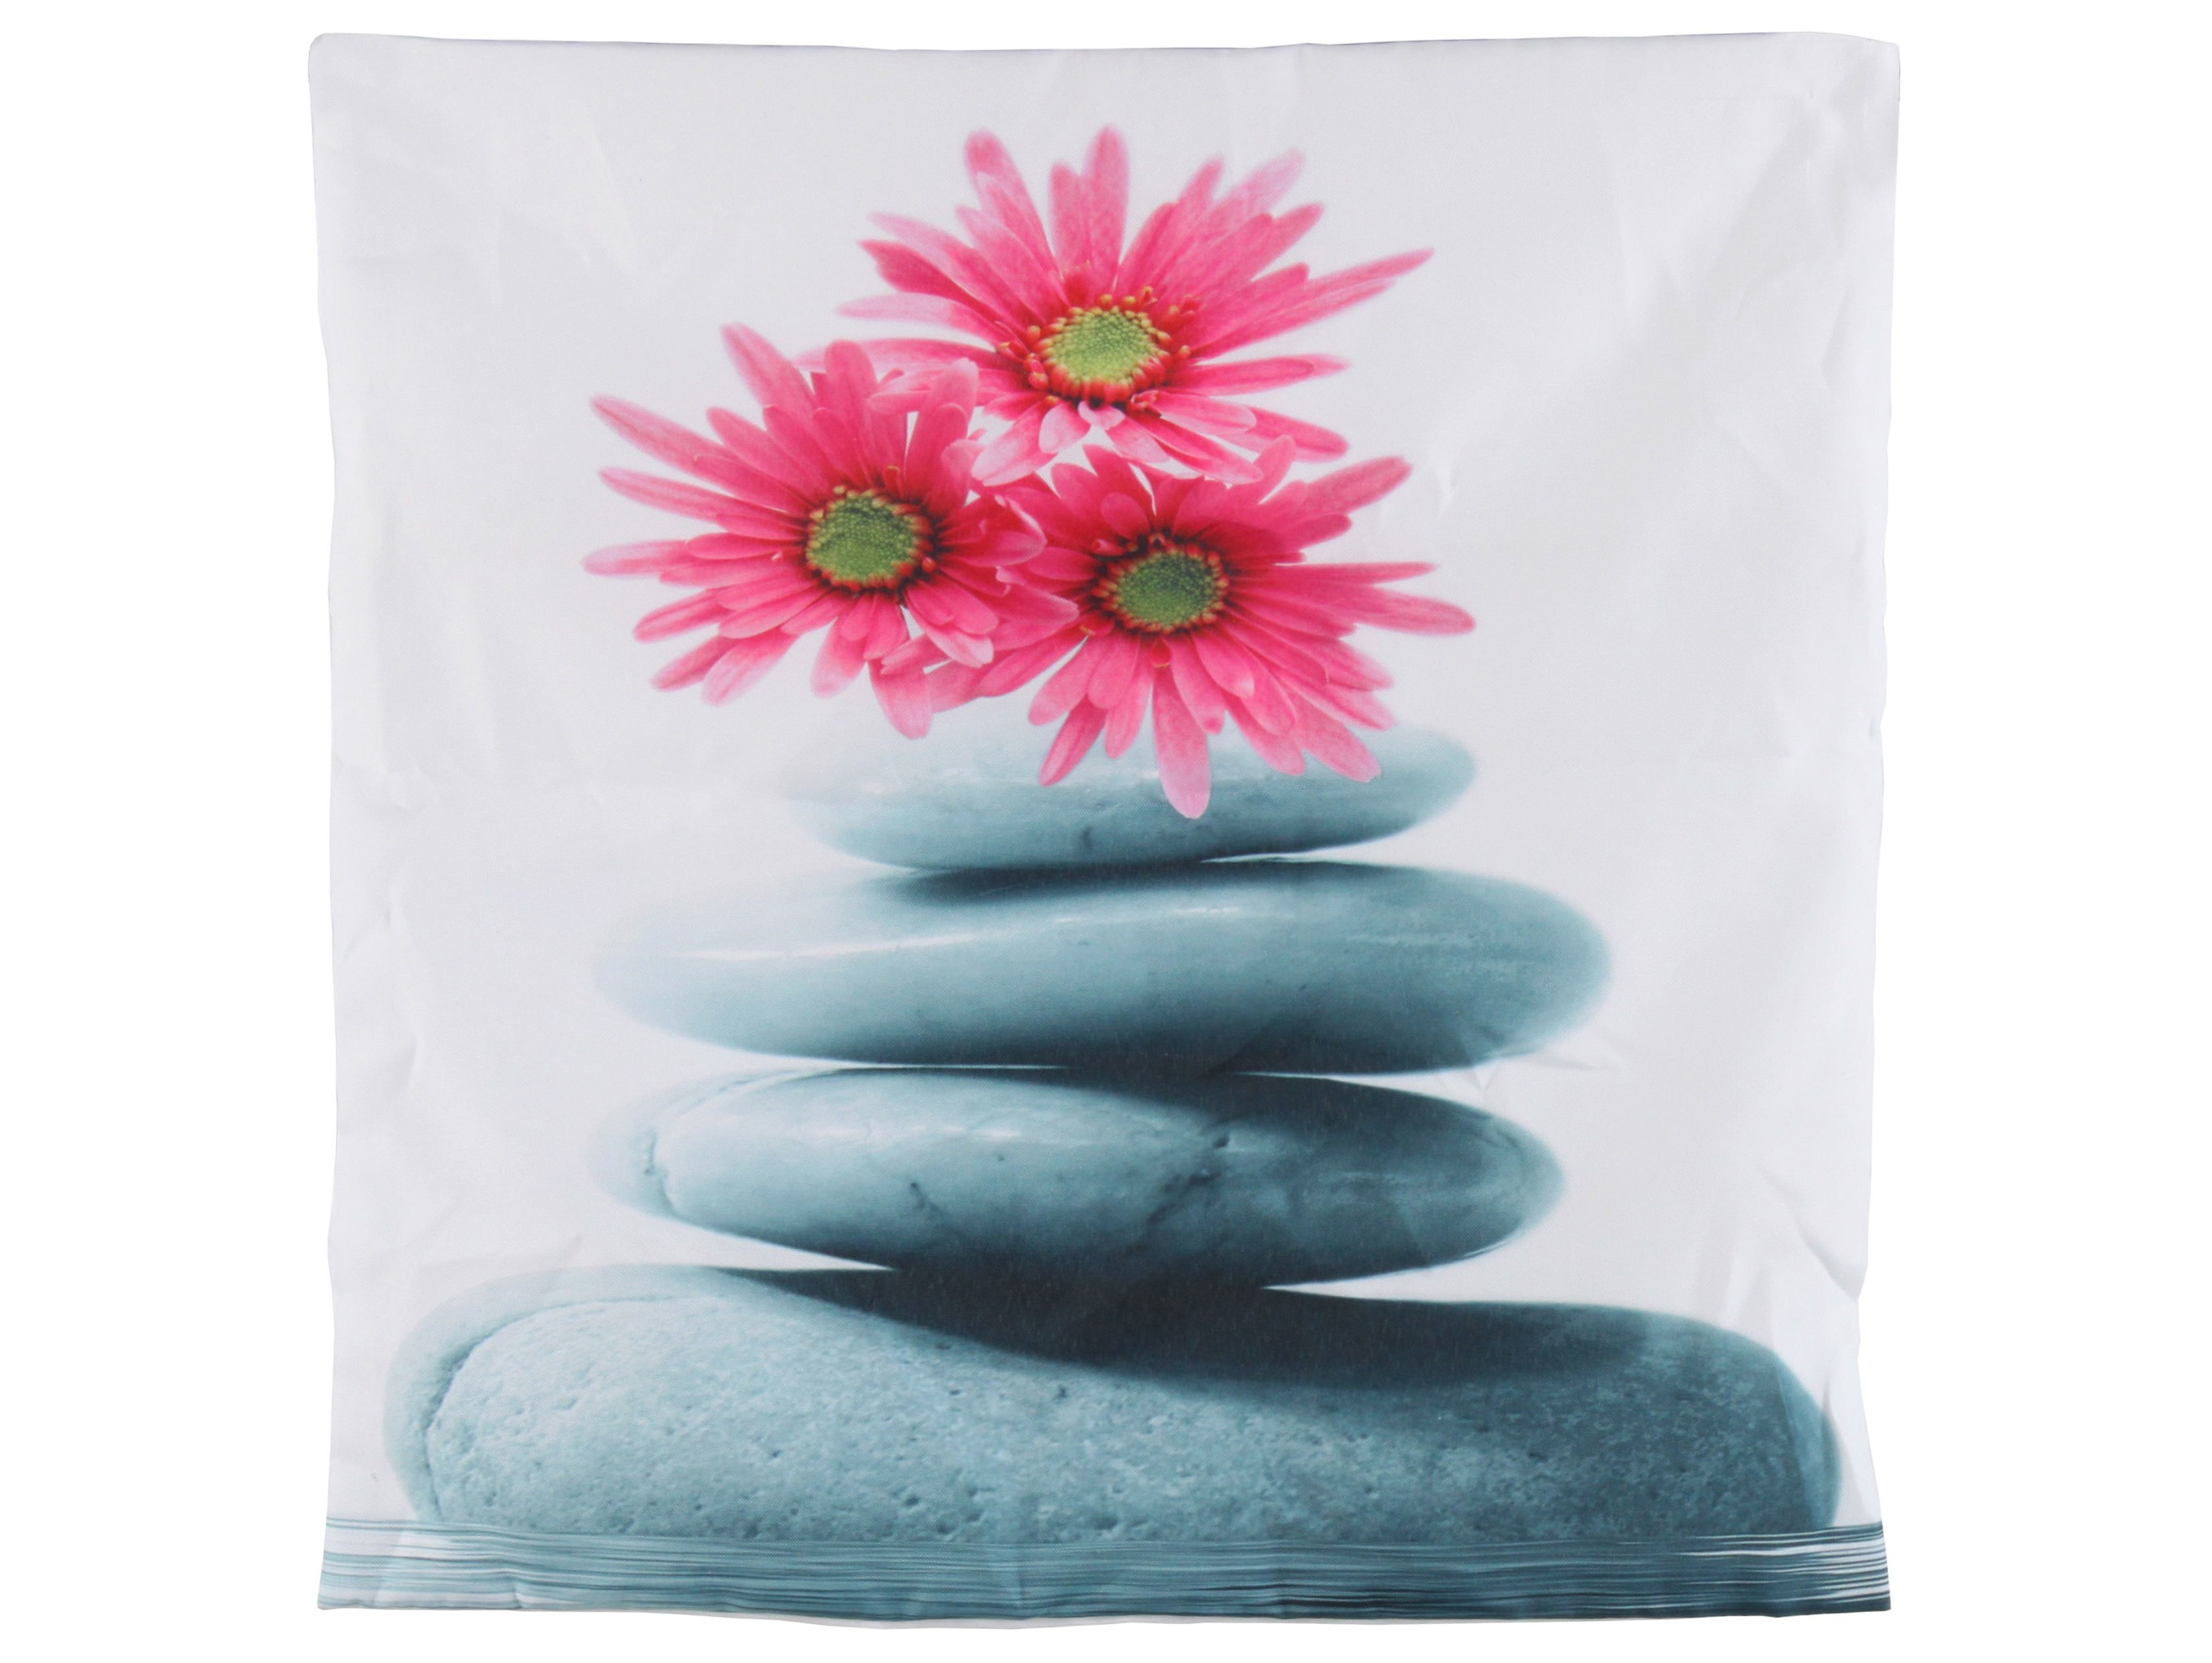 Подушка  PaisleyКвадратные подушки и наволочки<br><br><br>Material: Текстиль<br>Ширина см: 45<br>Высота см: 10<br>Глубина см: 45